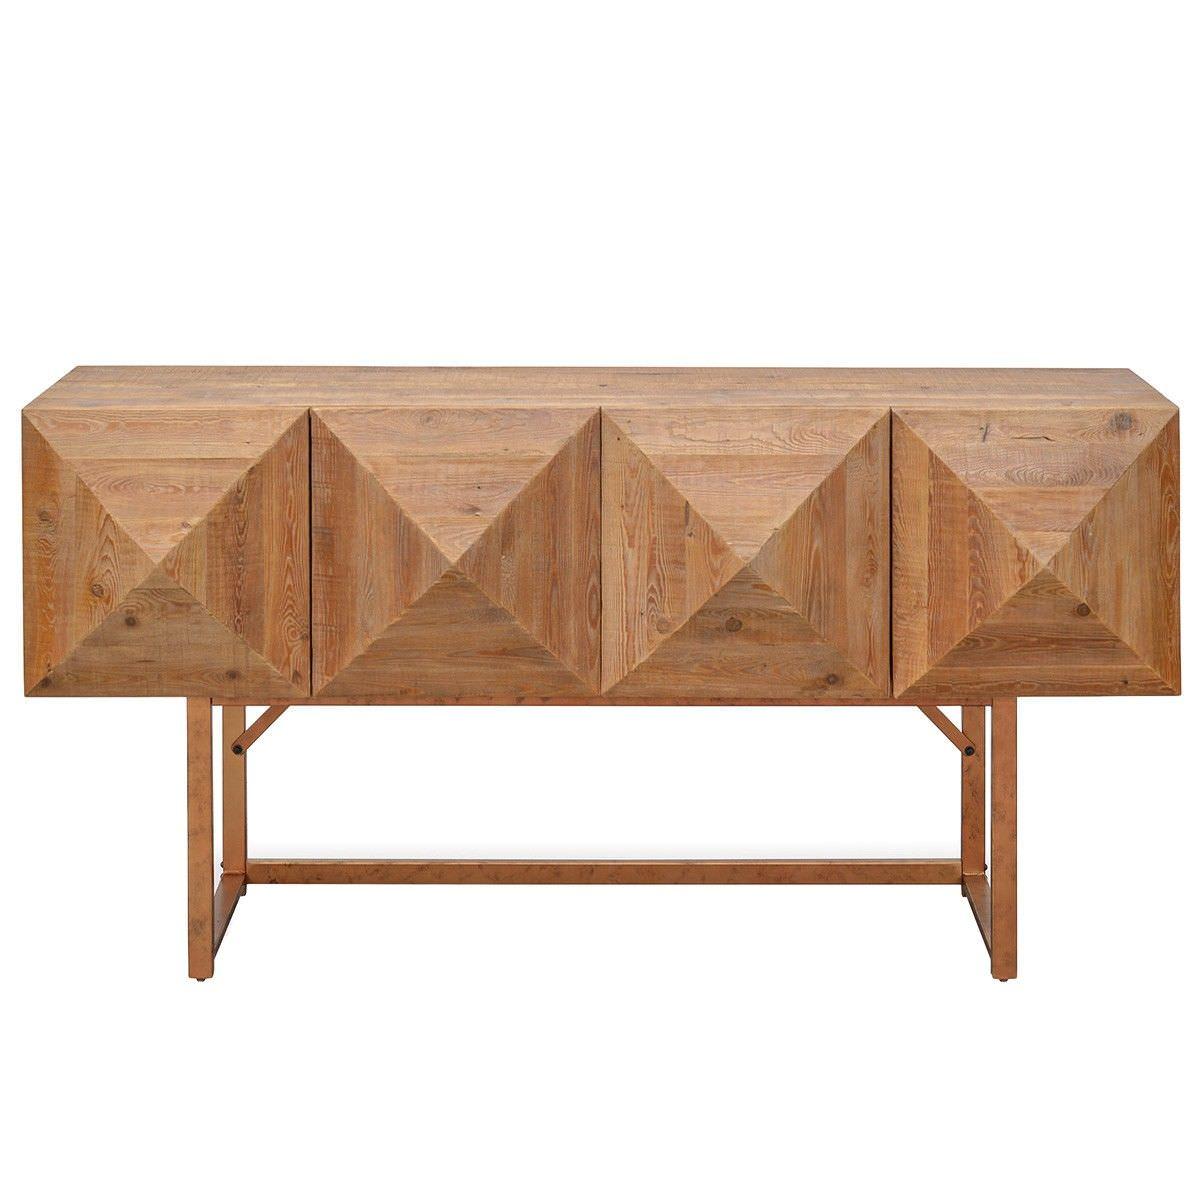 Berrigan Reclaimed Timber & Iron 4 Door Accent Console Table, 180cm, Natural